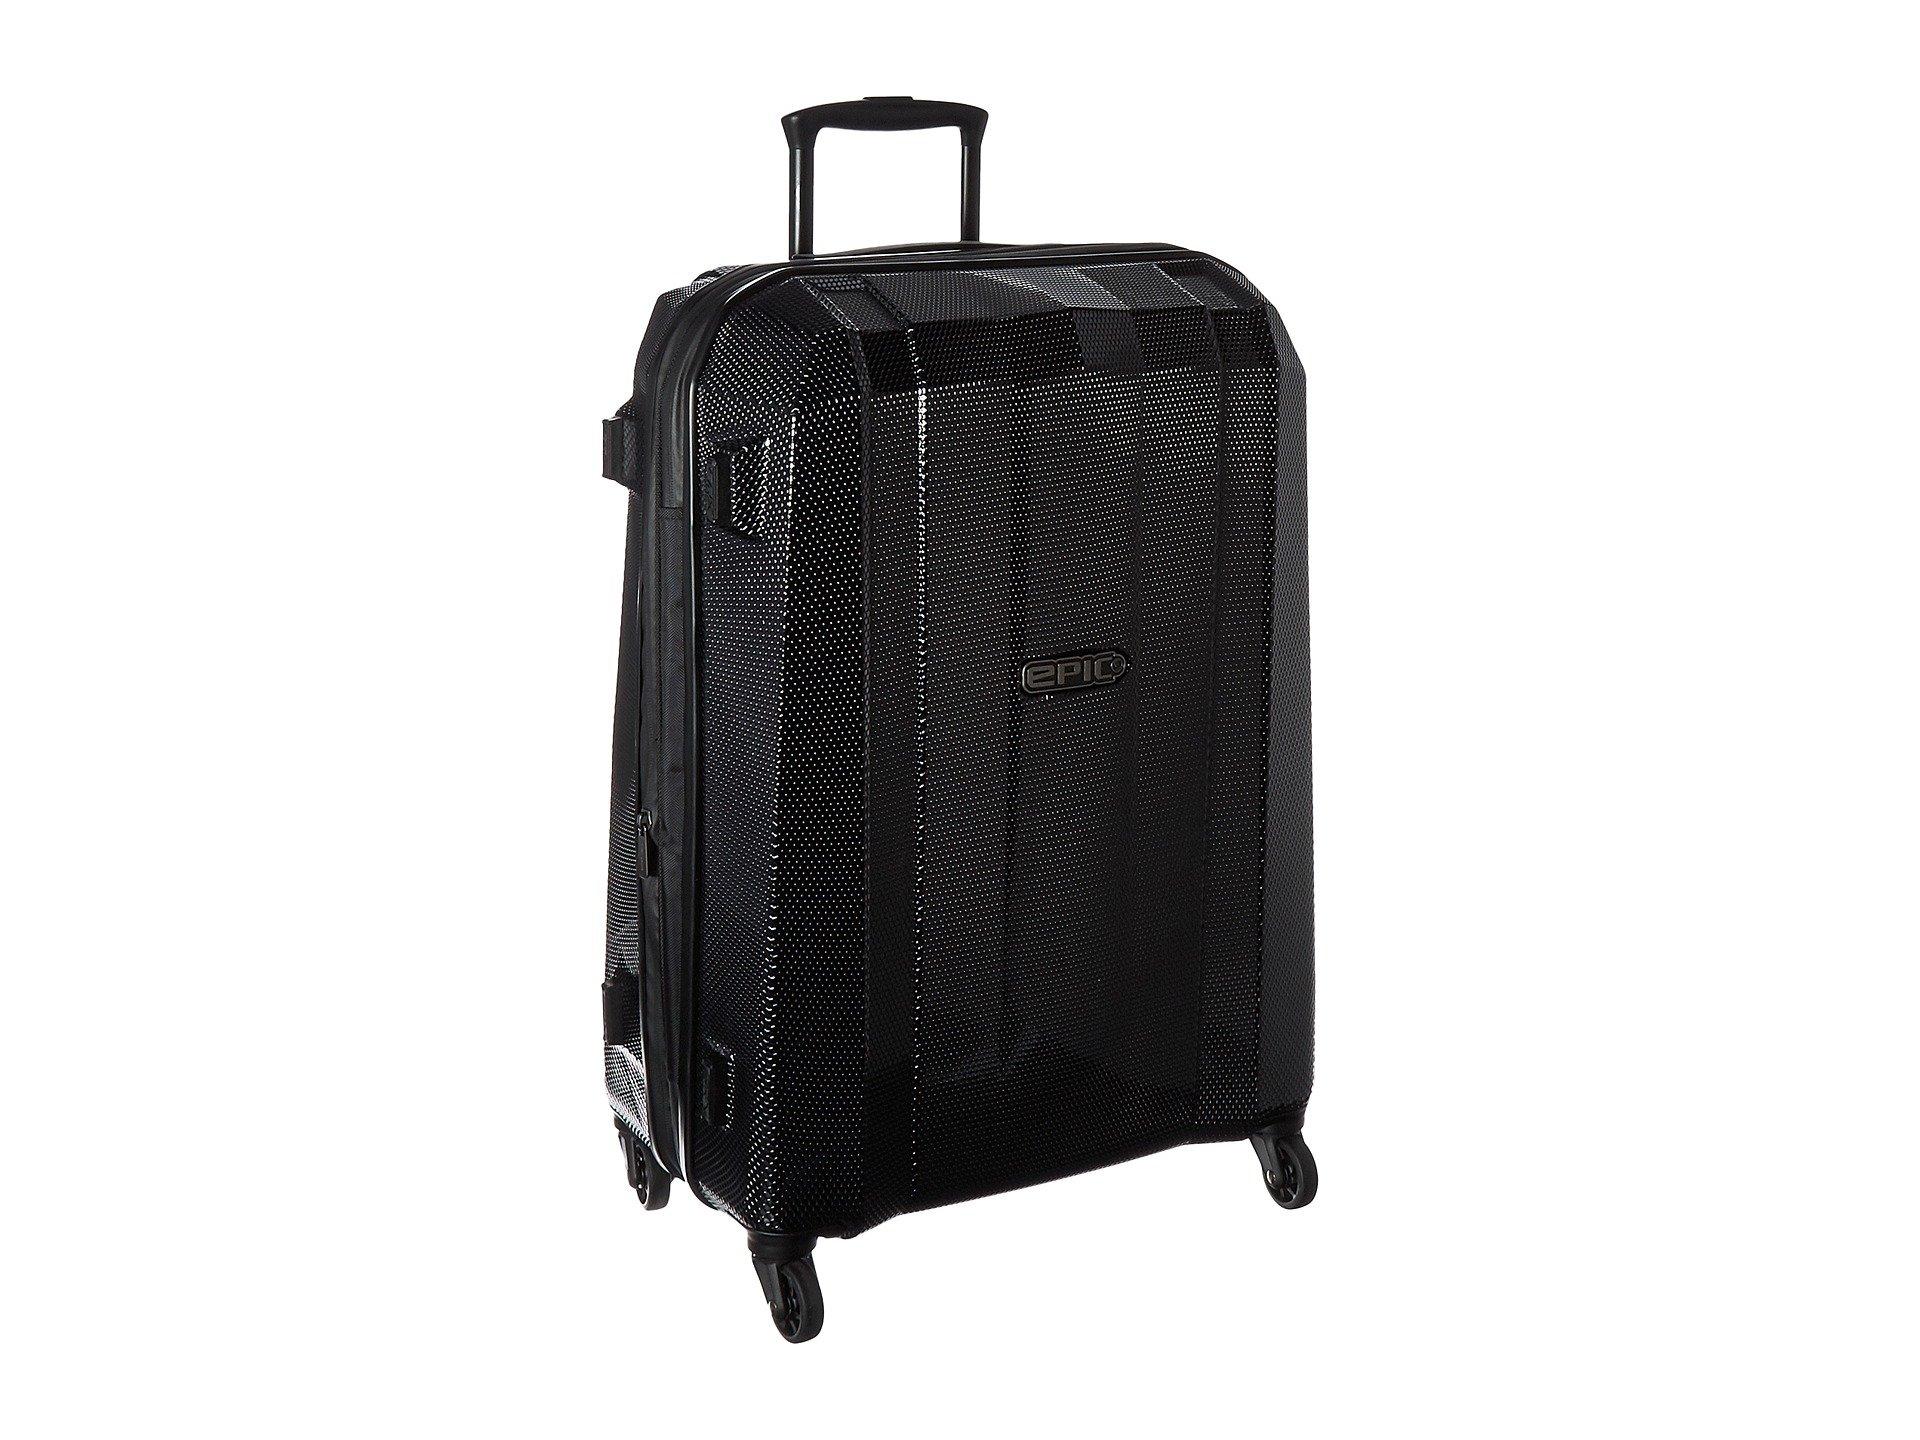 EPIC Travelgear Unisex GRX Hexacore EX 26'' Trolley Black Luggage by EPIC Travelgear